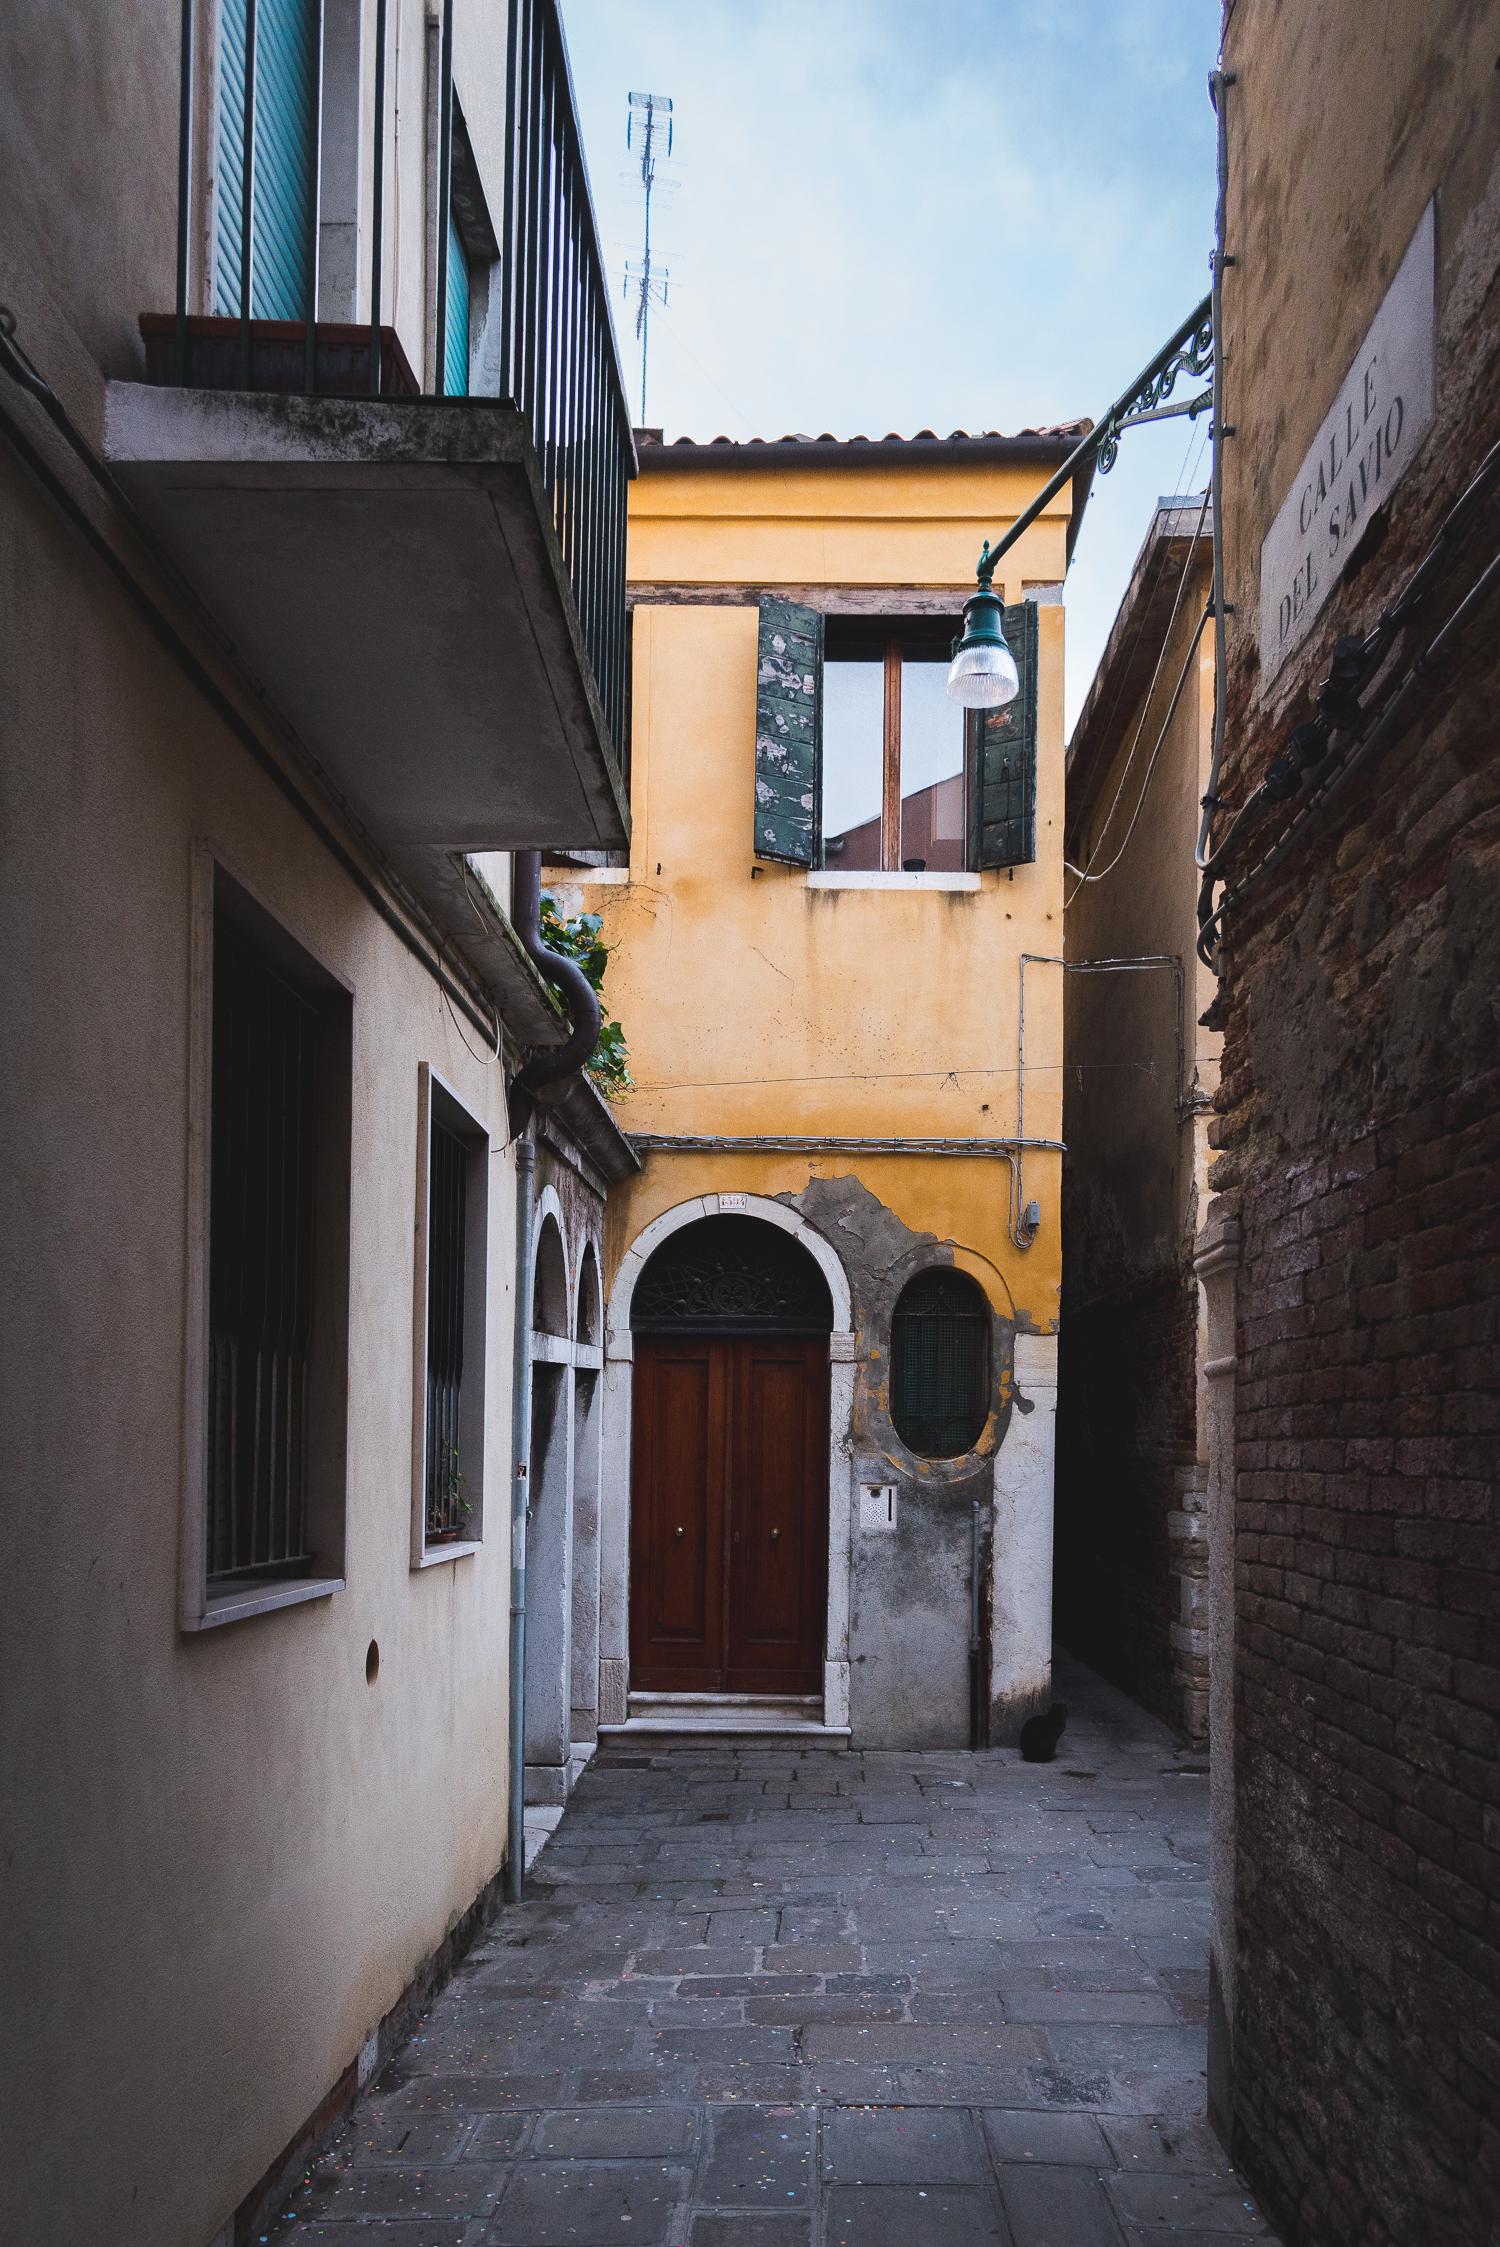 Residential Venice :)